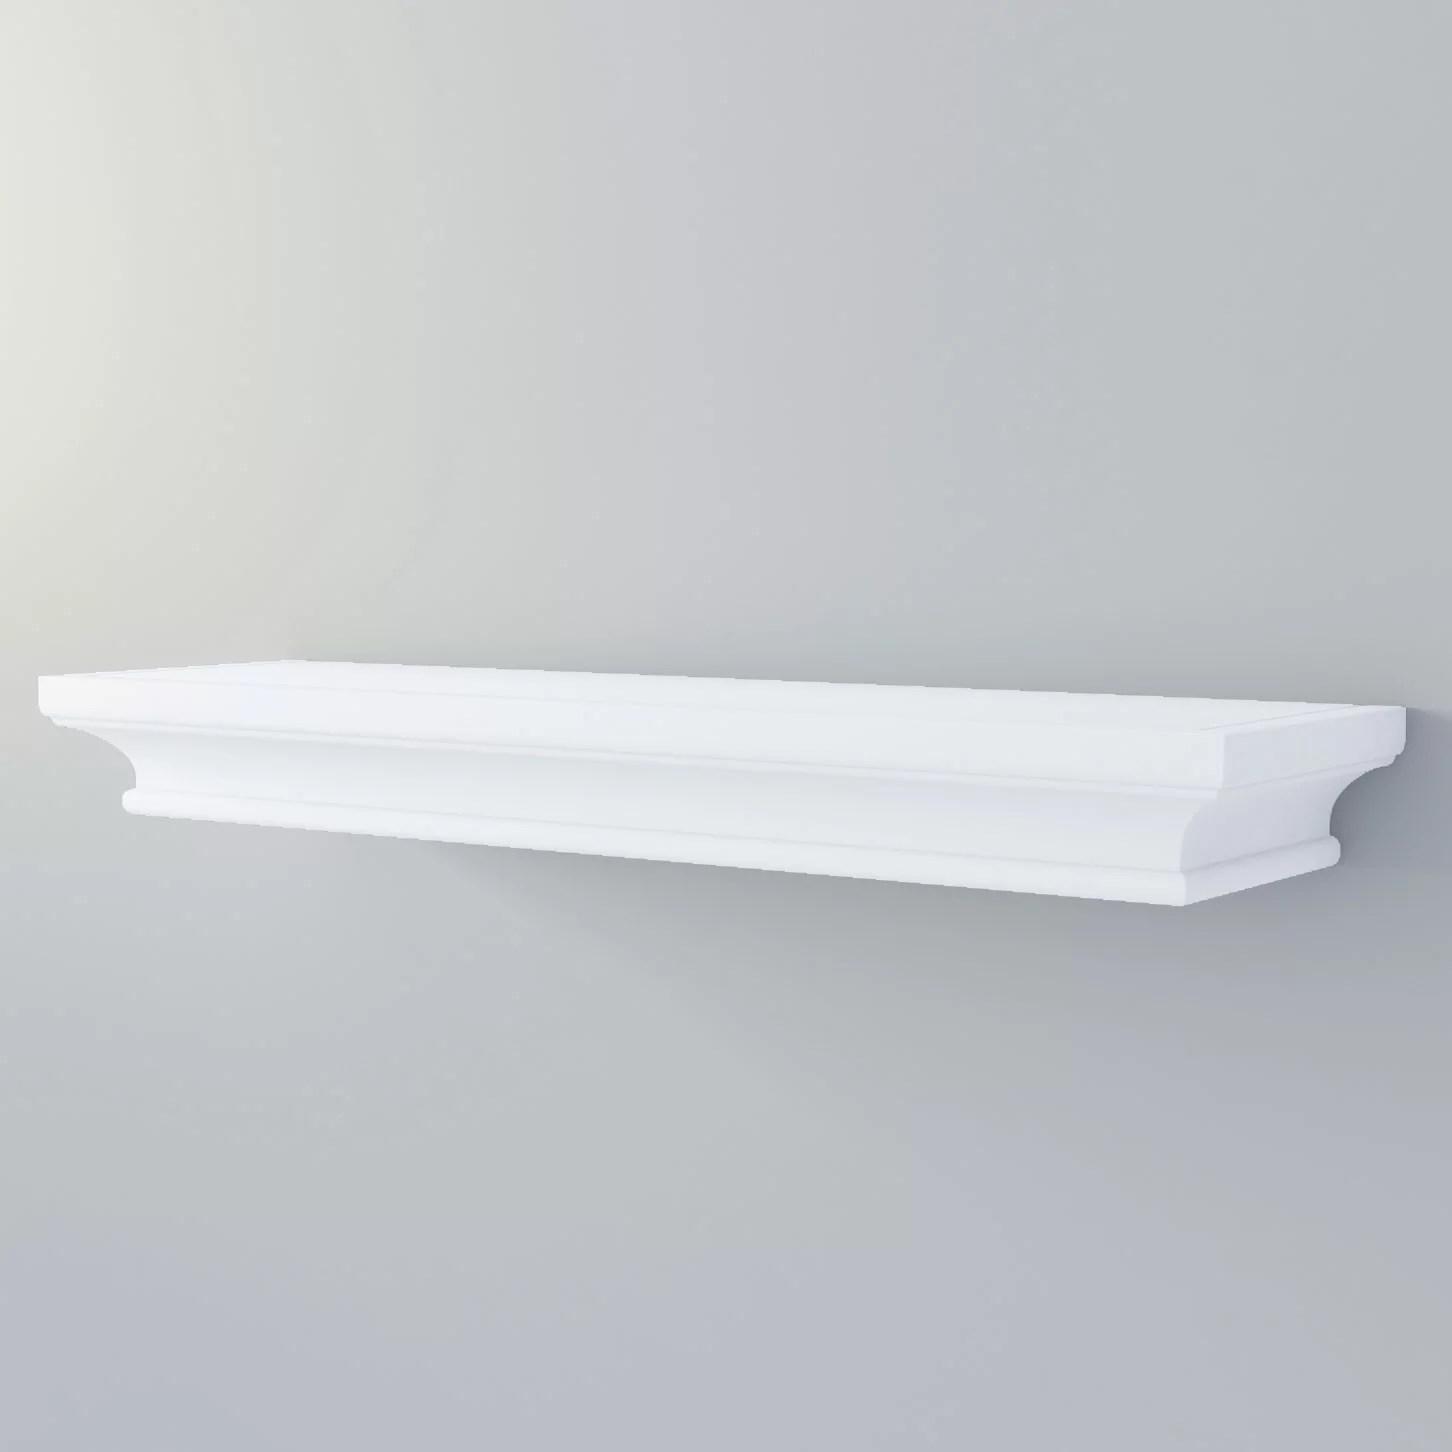 Bathroom Wall Shelf Mantle Decorative Molding for Storage